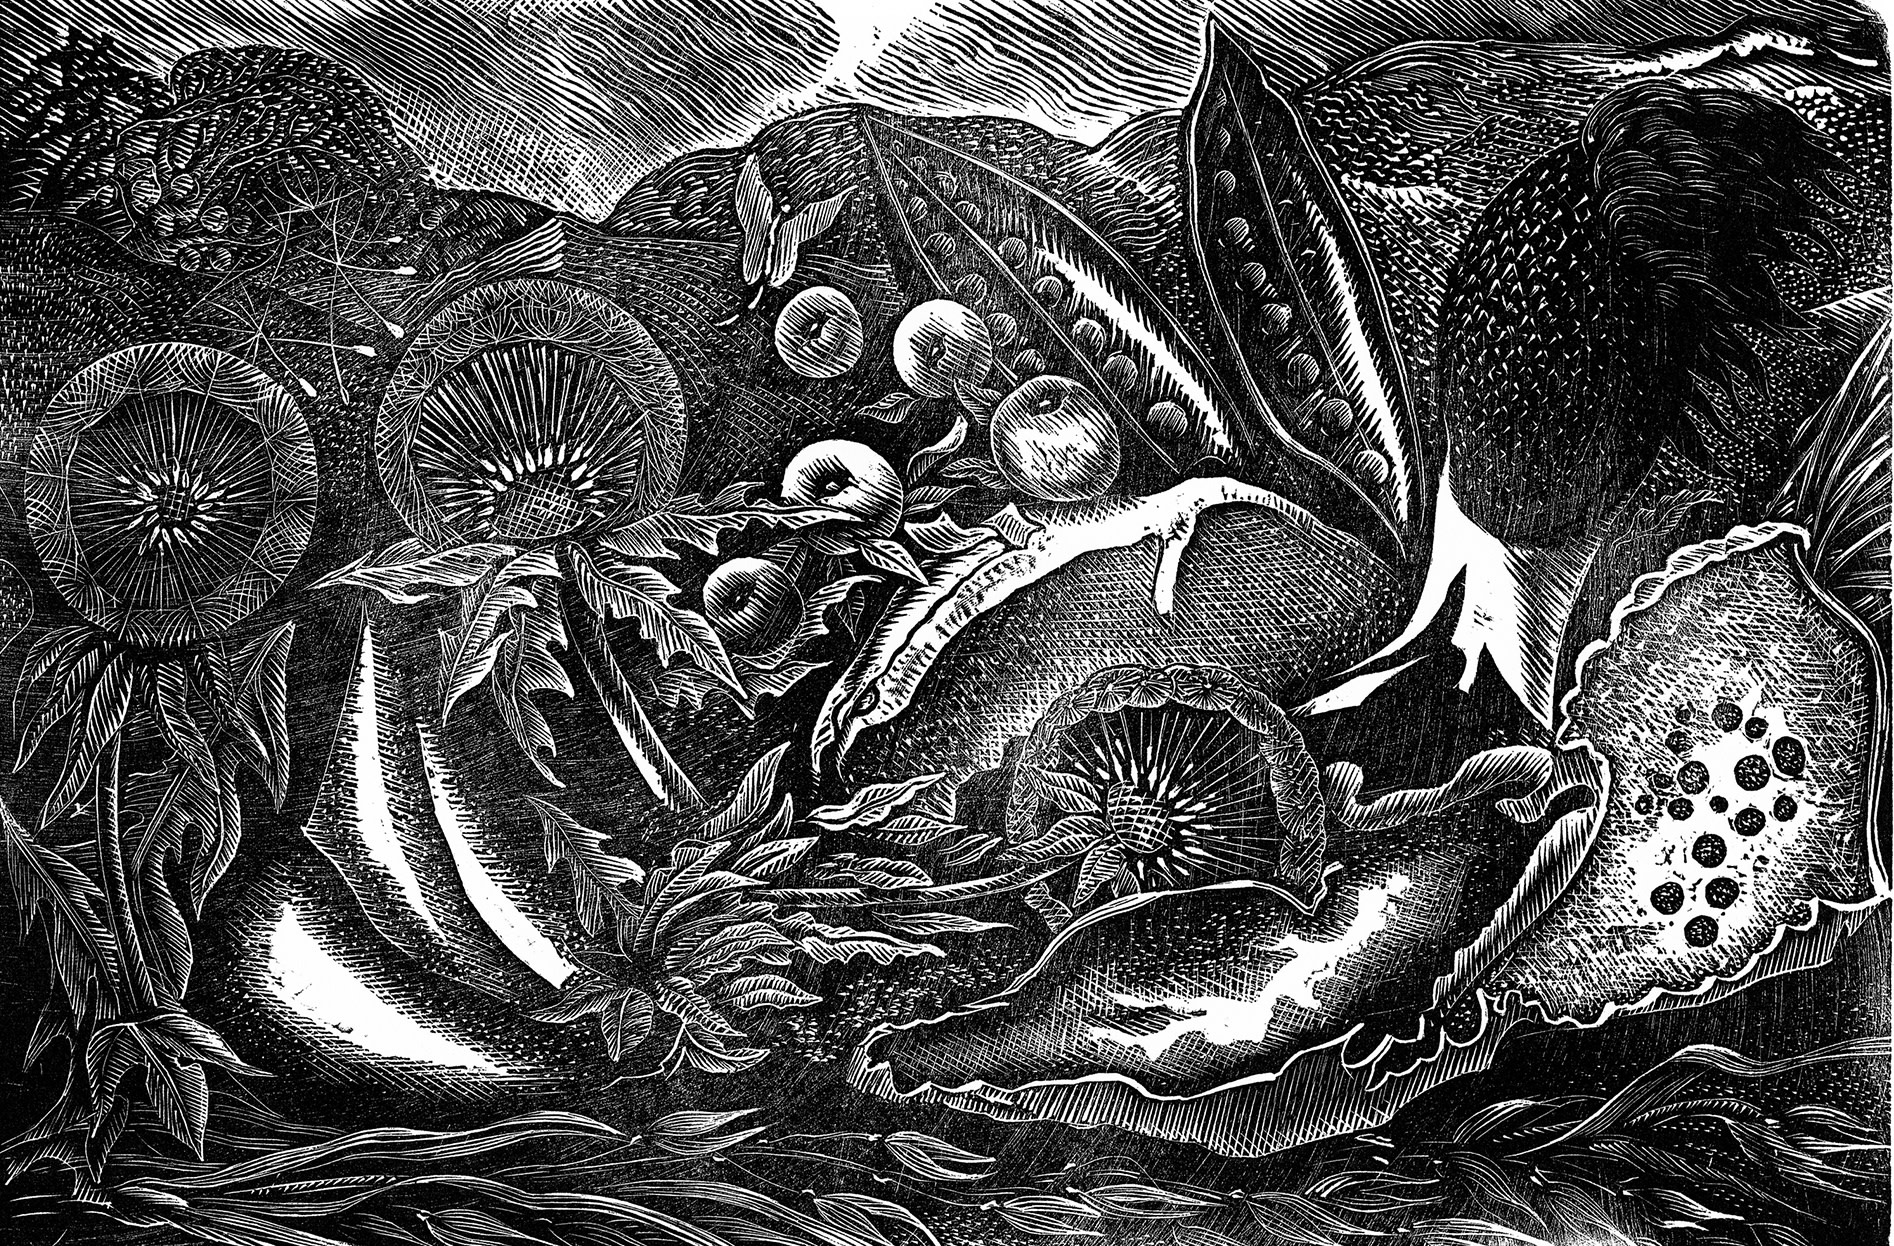 "<span class=""link fancybox-details-link""><a href=""/artists/136-george-tute-re/works/9460/"">View Detail Page</a></span><div class=""artist""><span class=""artist""><strong>George Tute RE</strong></span></div><div class=""title""><em>Nature Morte II</em></div><div class=""medium"">wood engraving</div>"